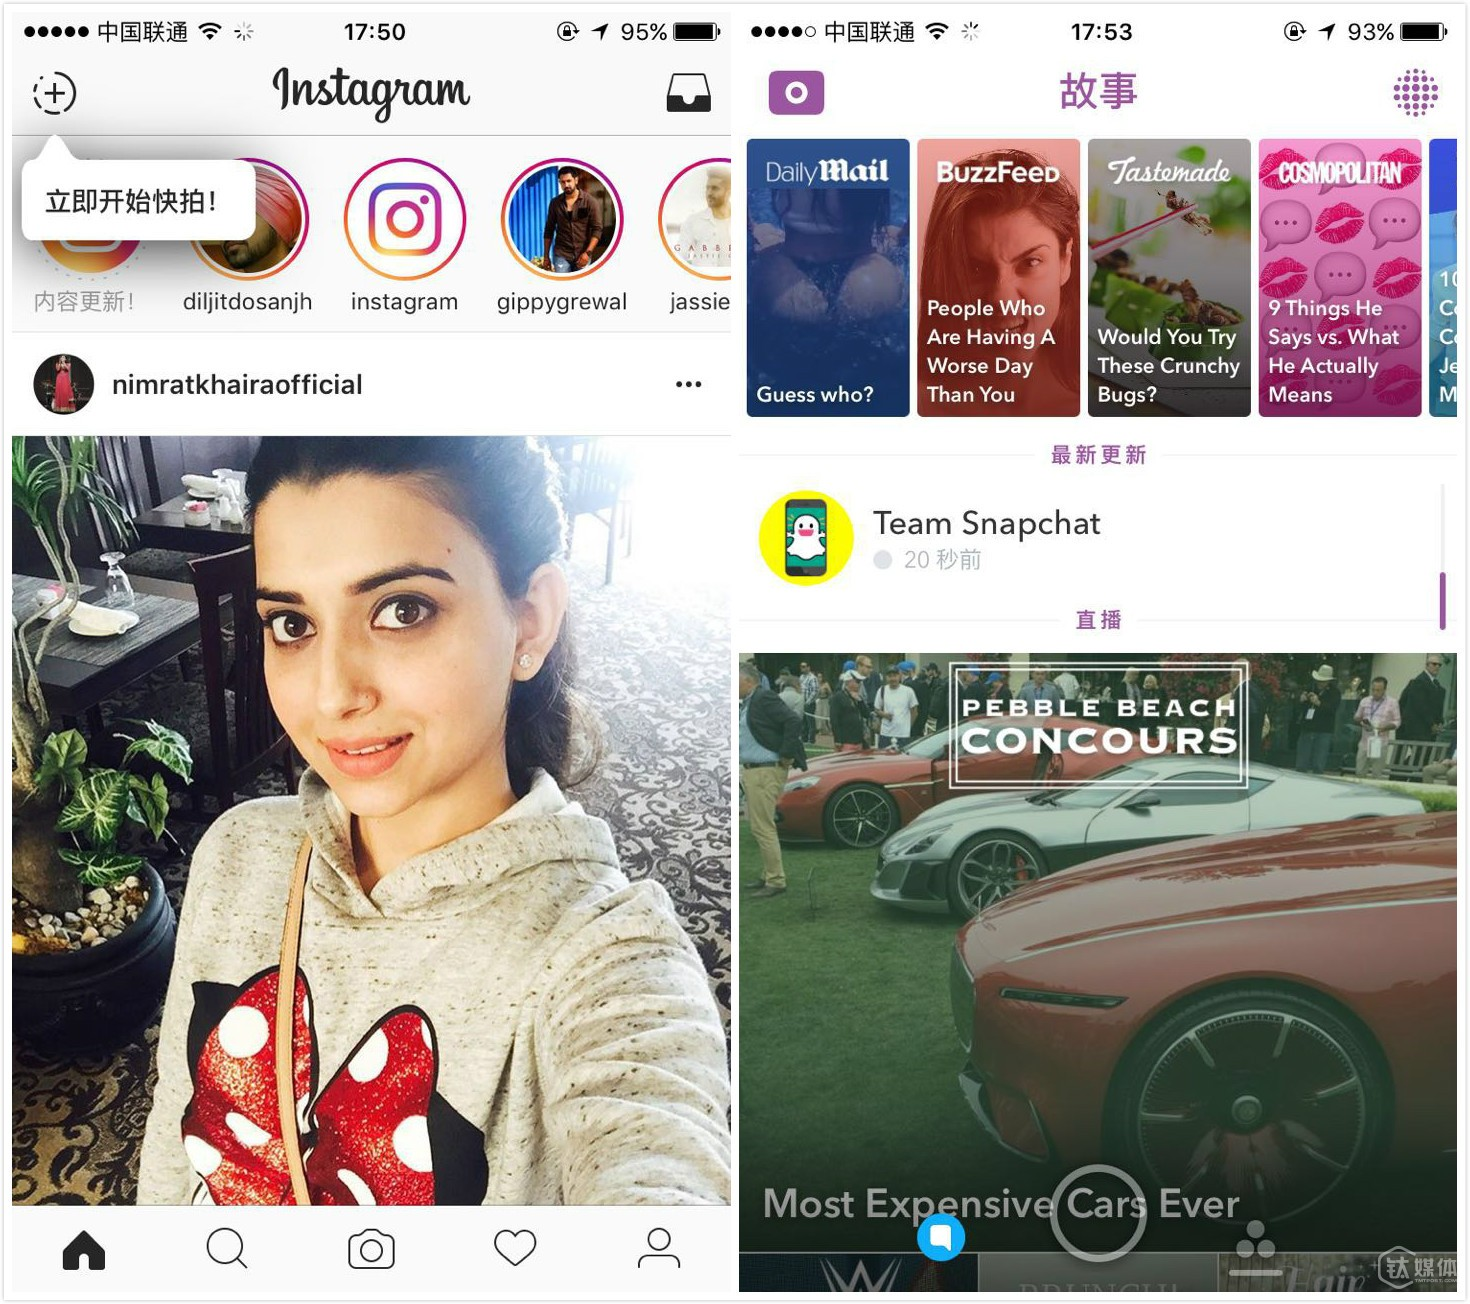 Instagram Stories与Snapchat Stories界面对比